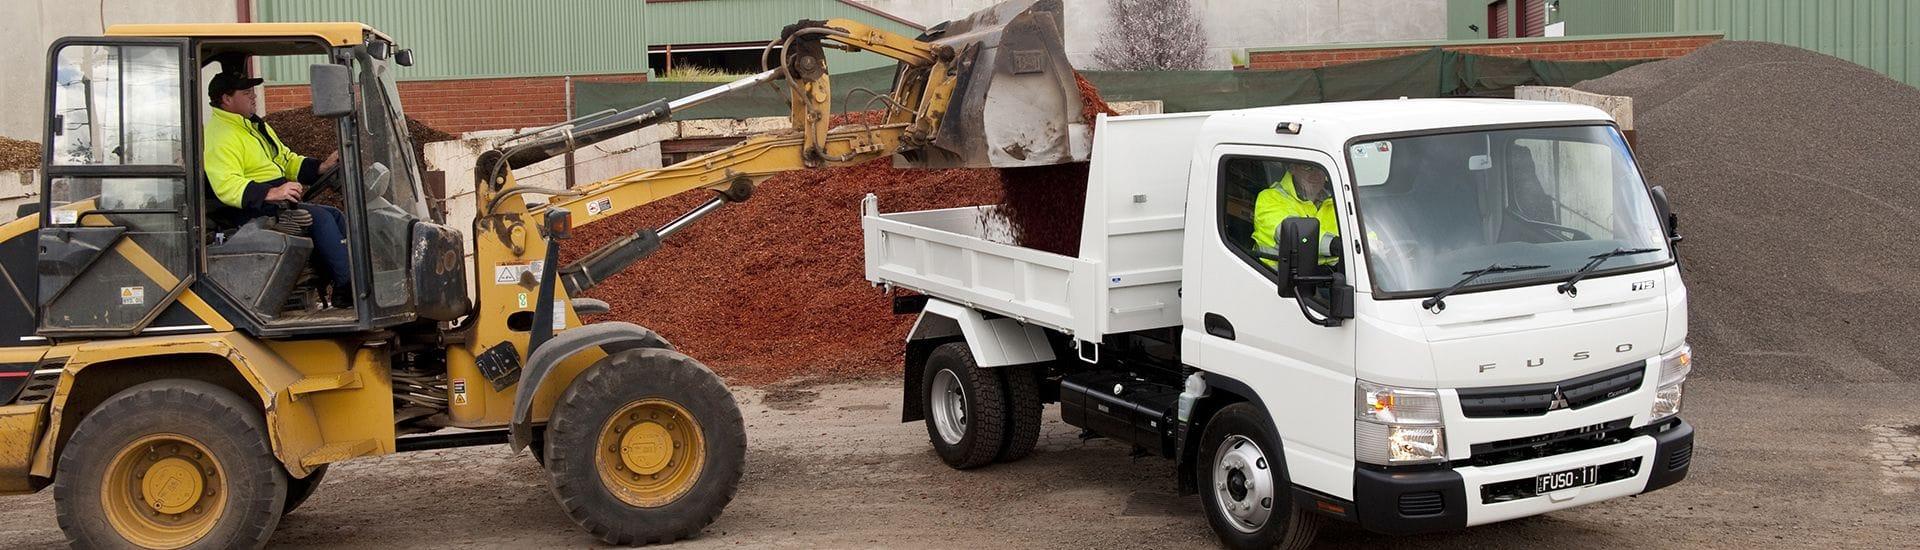 Covid19 Response | Daimler Trucks Wagga & Albury